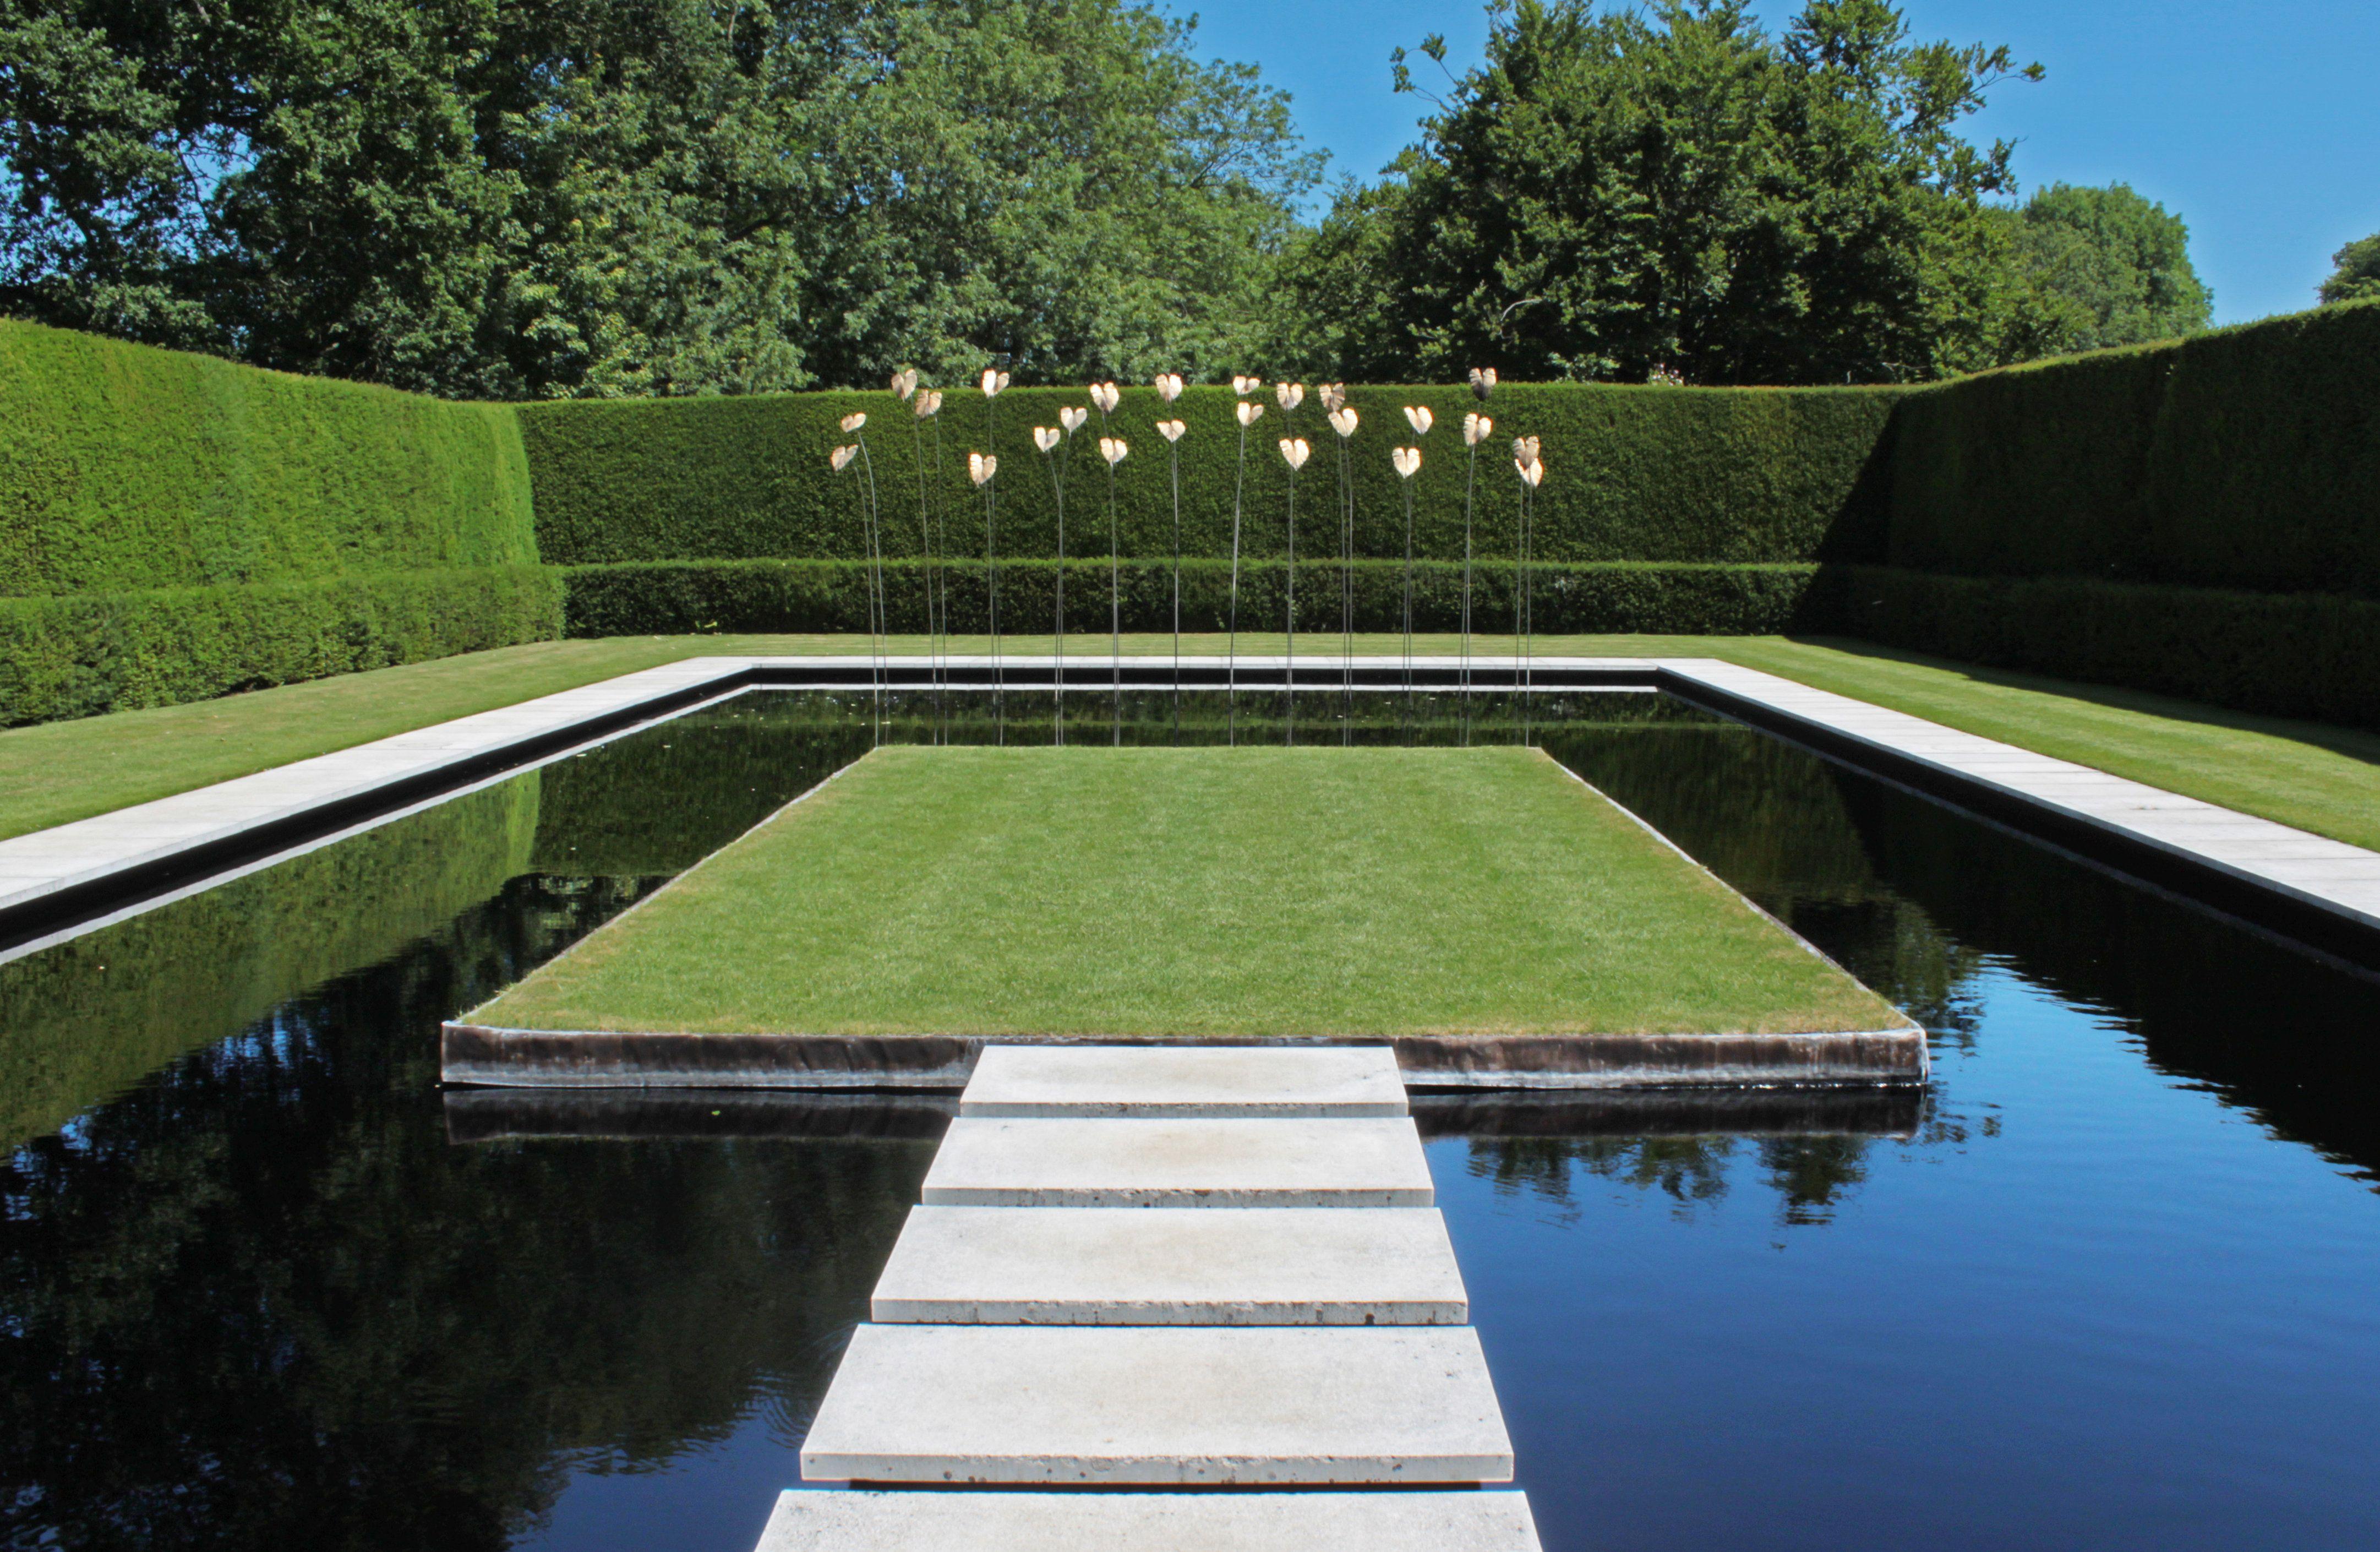 British Gardens: History, philosophy and design: Tom Turner